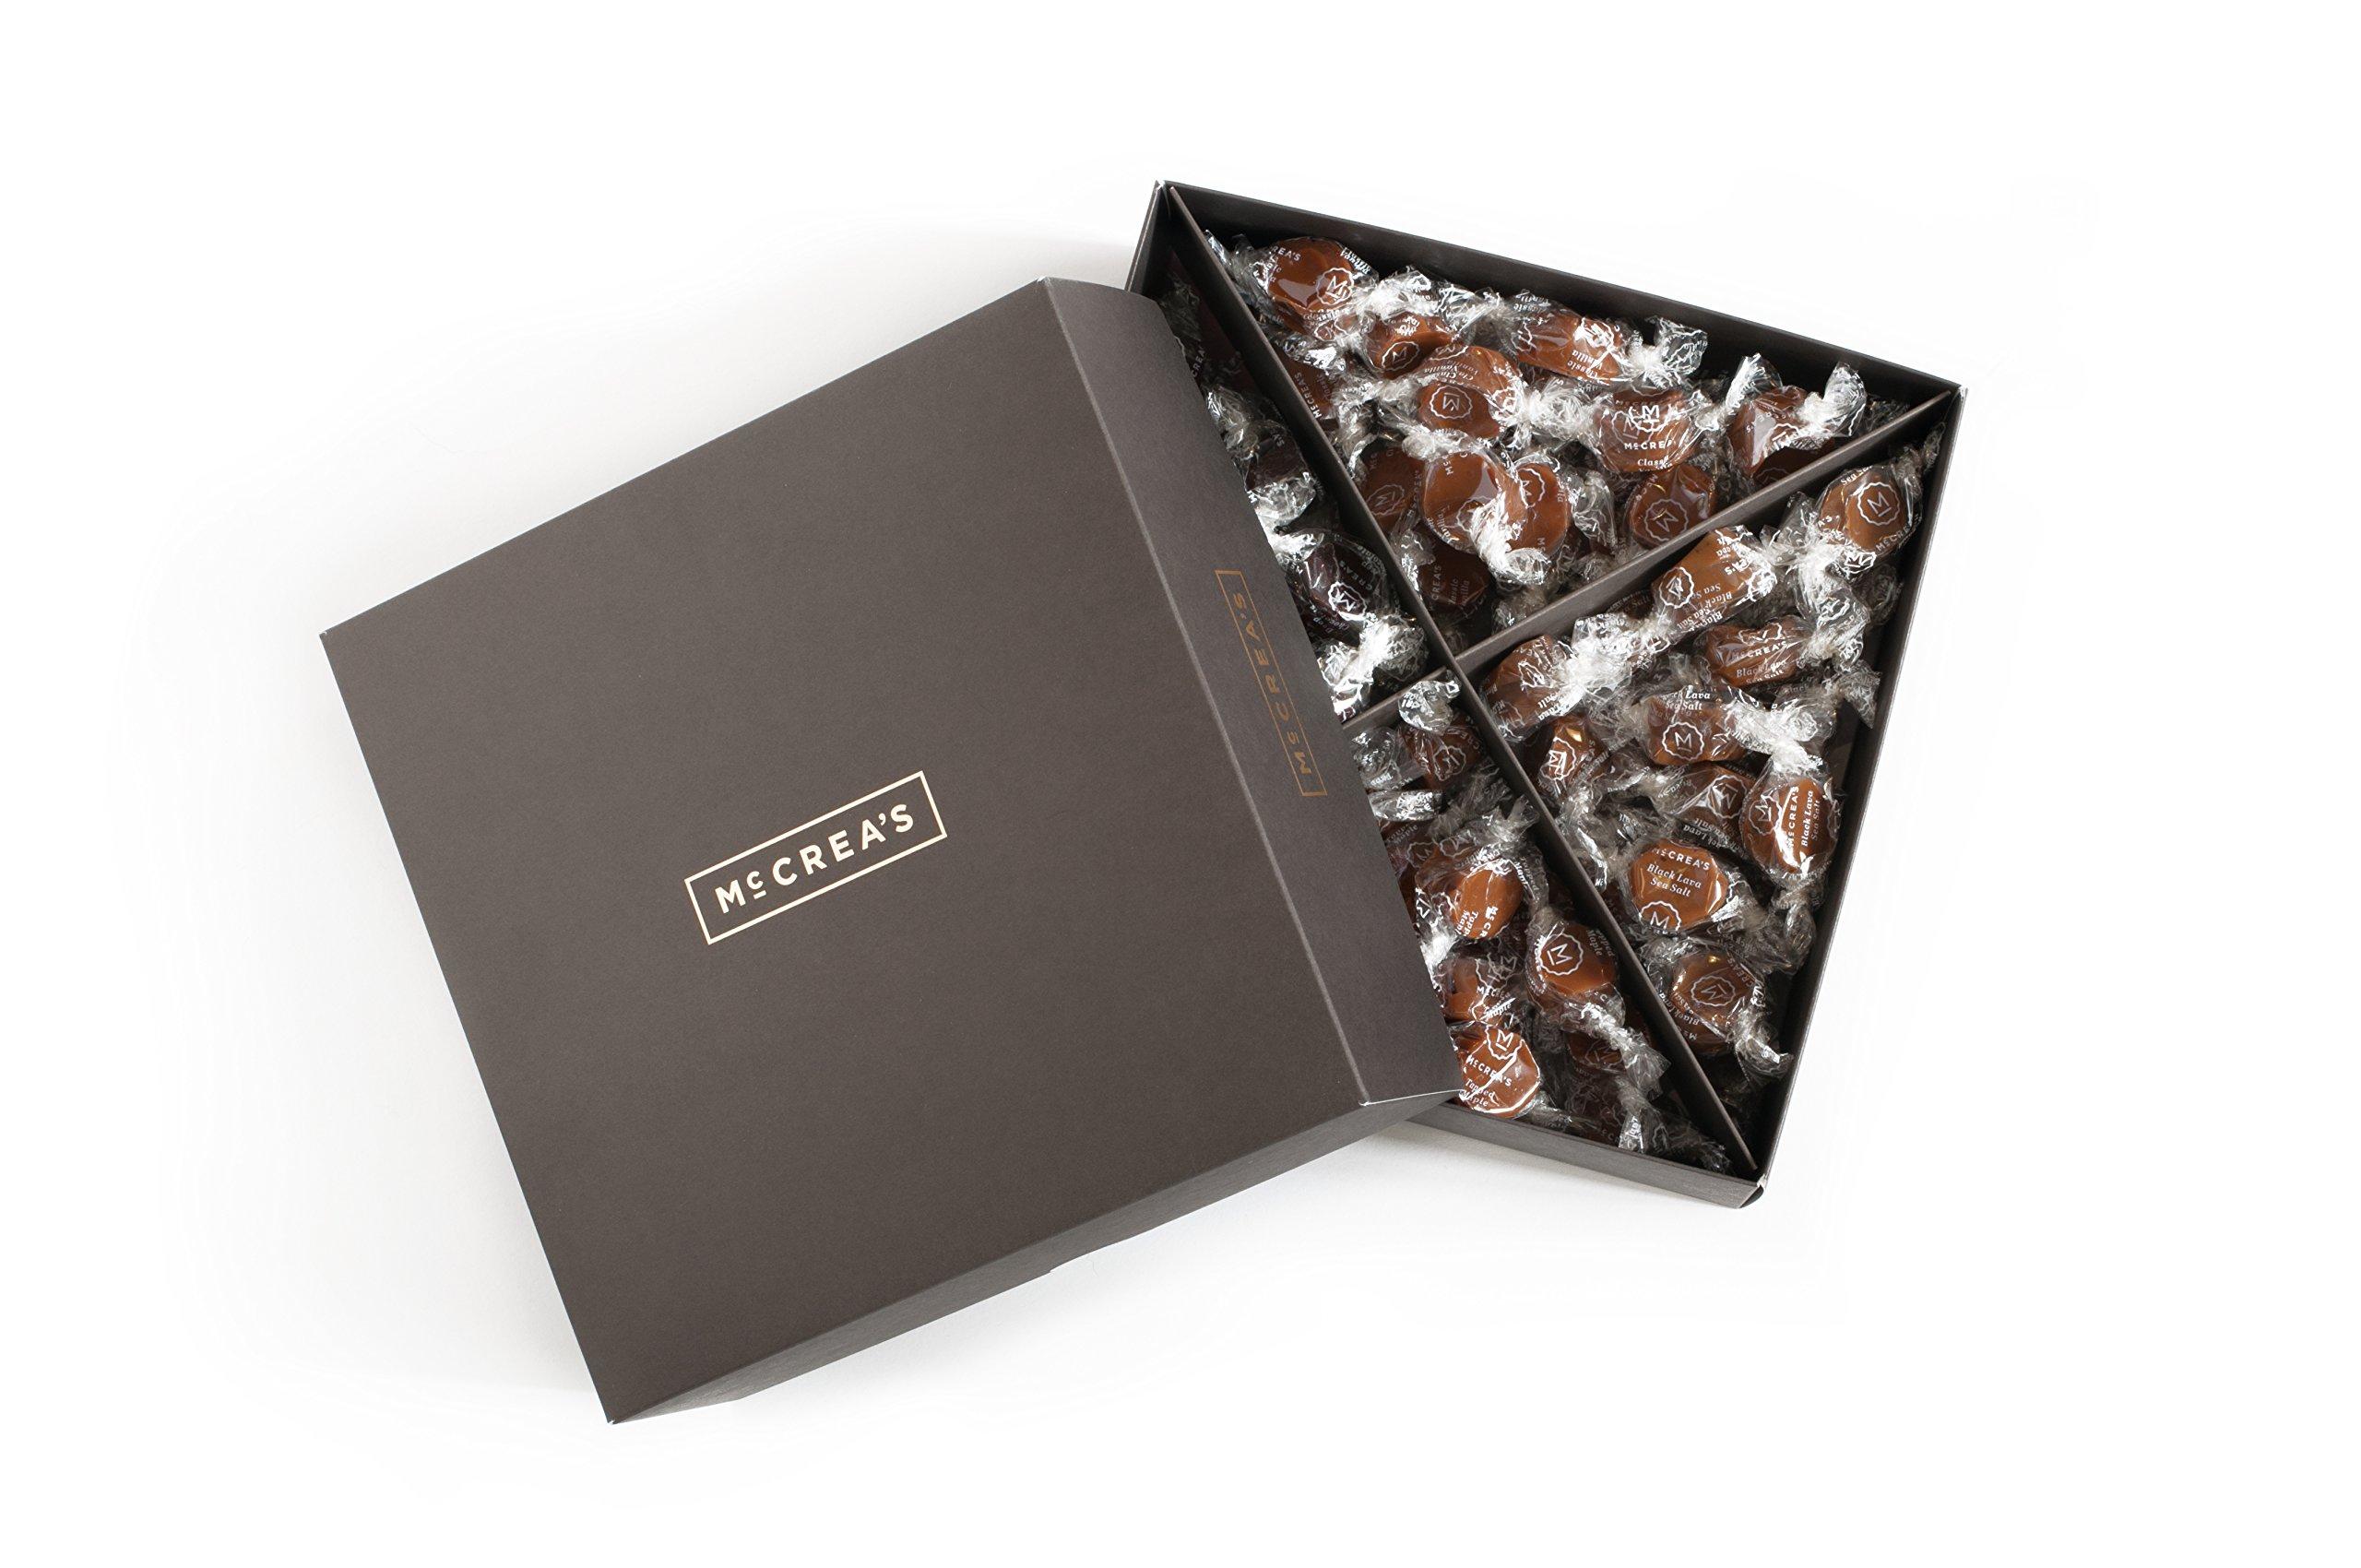 McCrea's Candies Party Box Black Lava Sea Salt Deep Chocolate Tapped Maple Vanilla Caramels Made in Boston